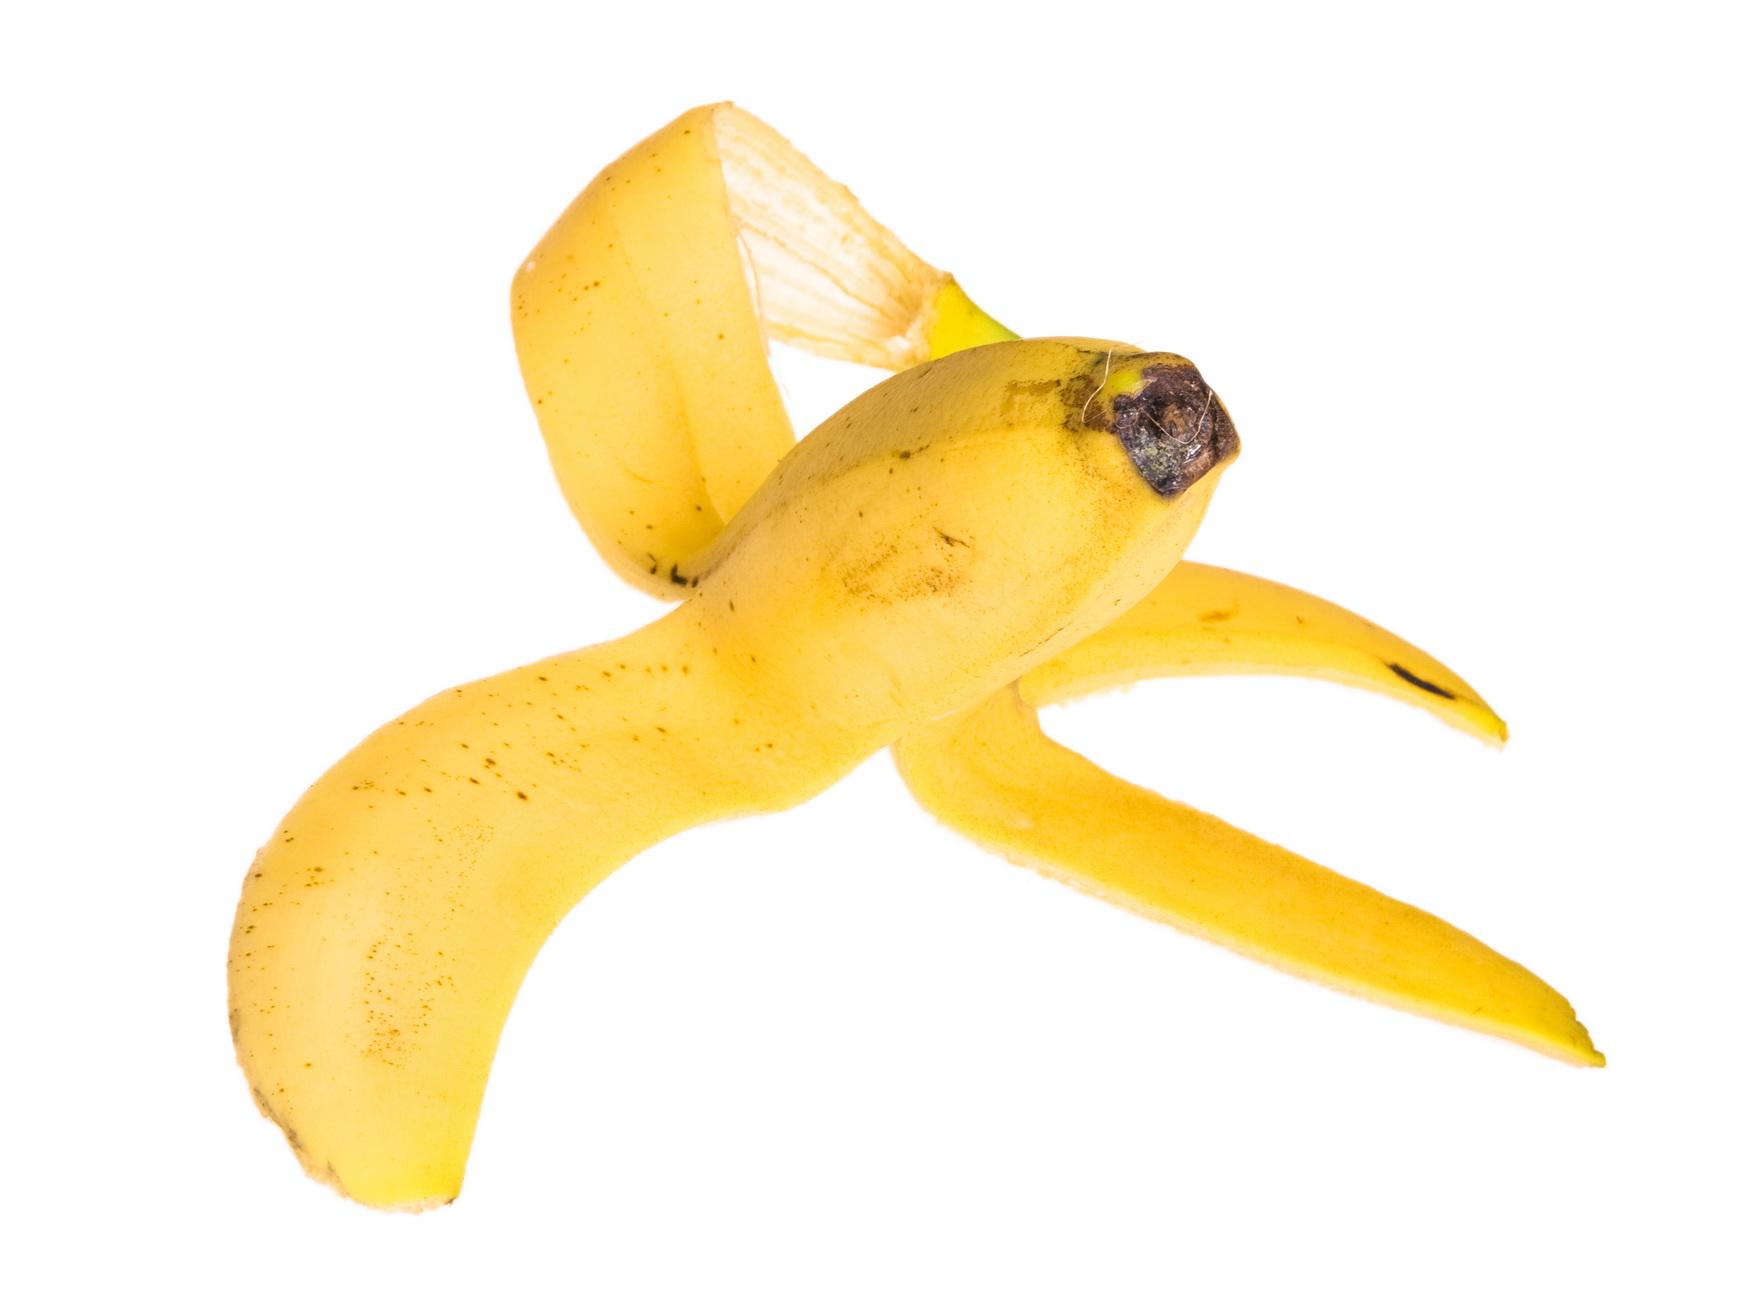 banana peel, Banana, Risk, Nature, Nobody, HQ Photo